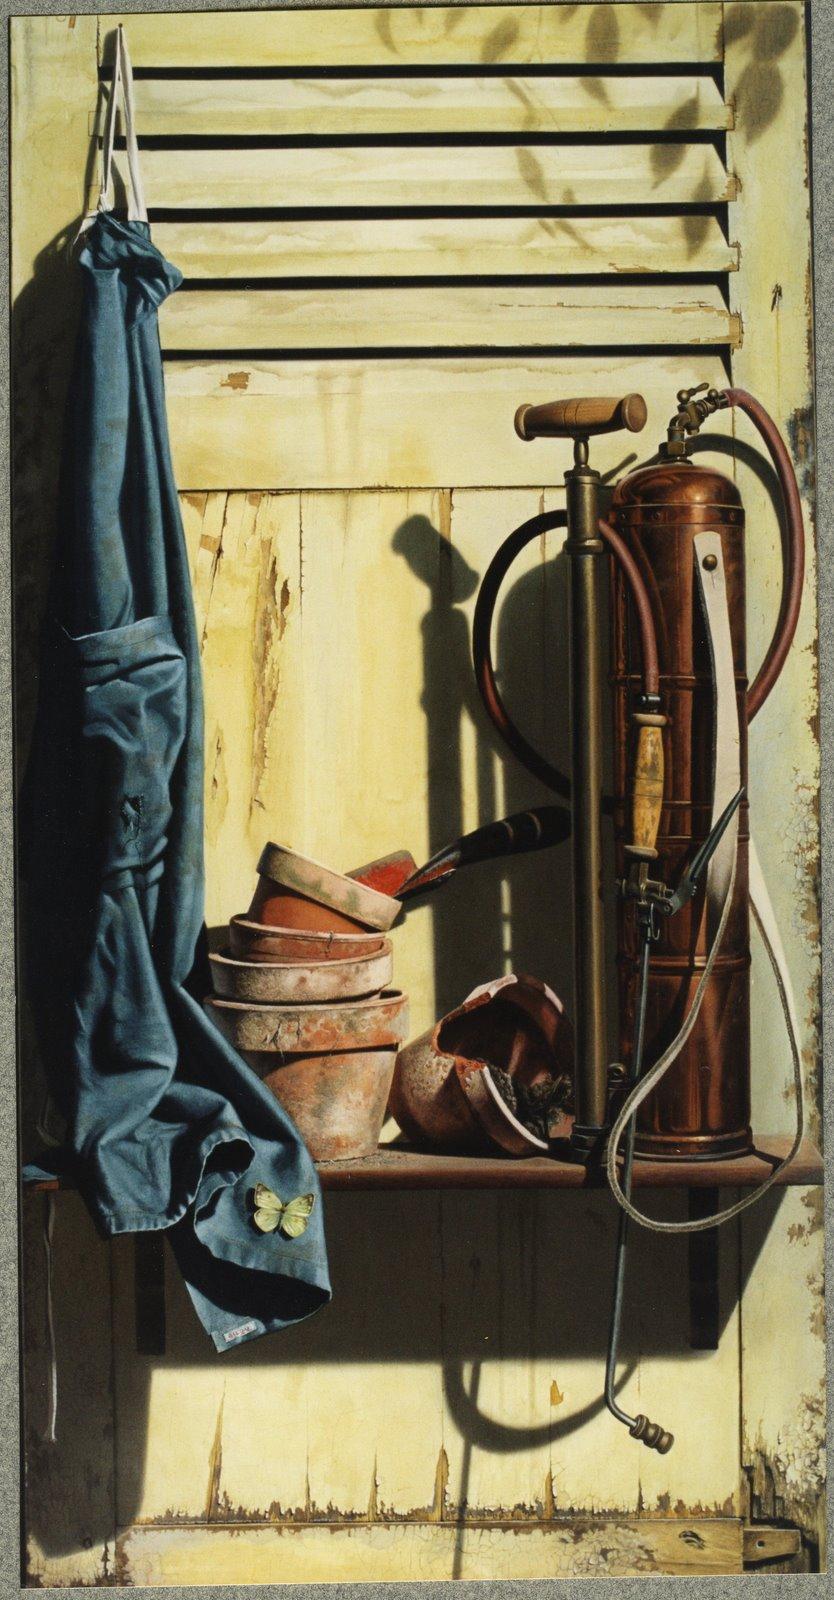 Gilou, Volet de jardin - 134,5 x64,5